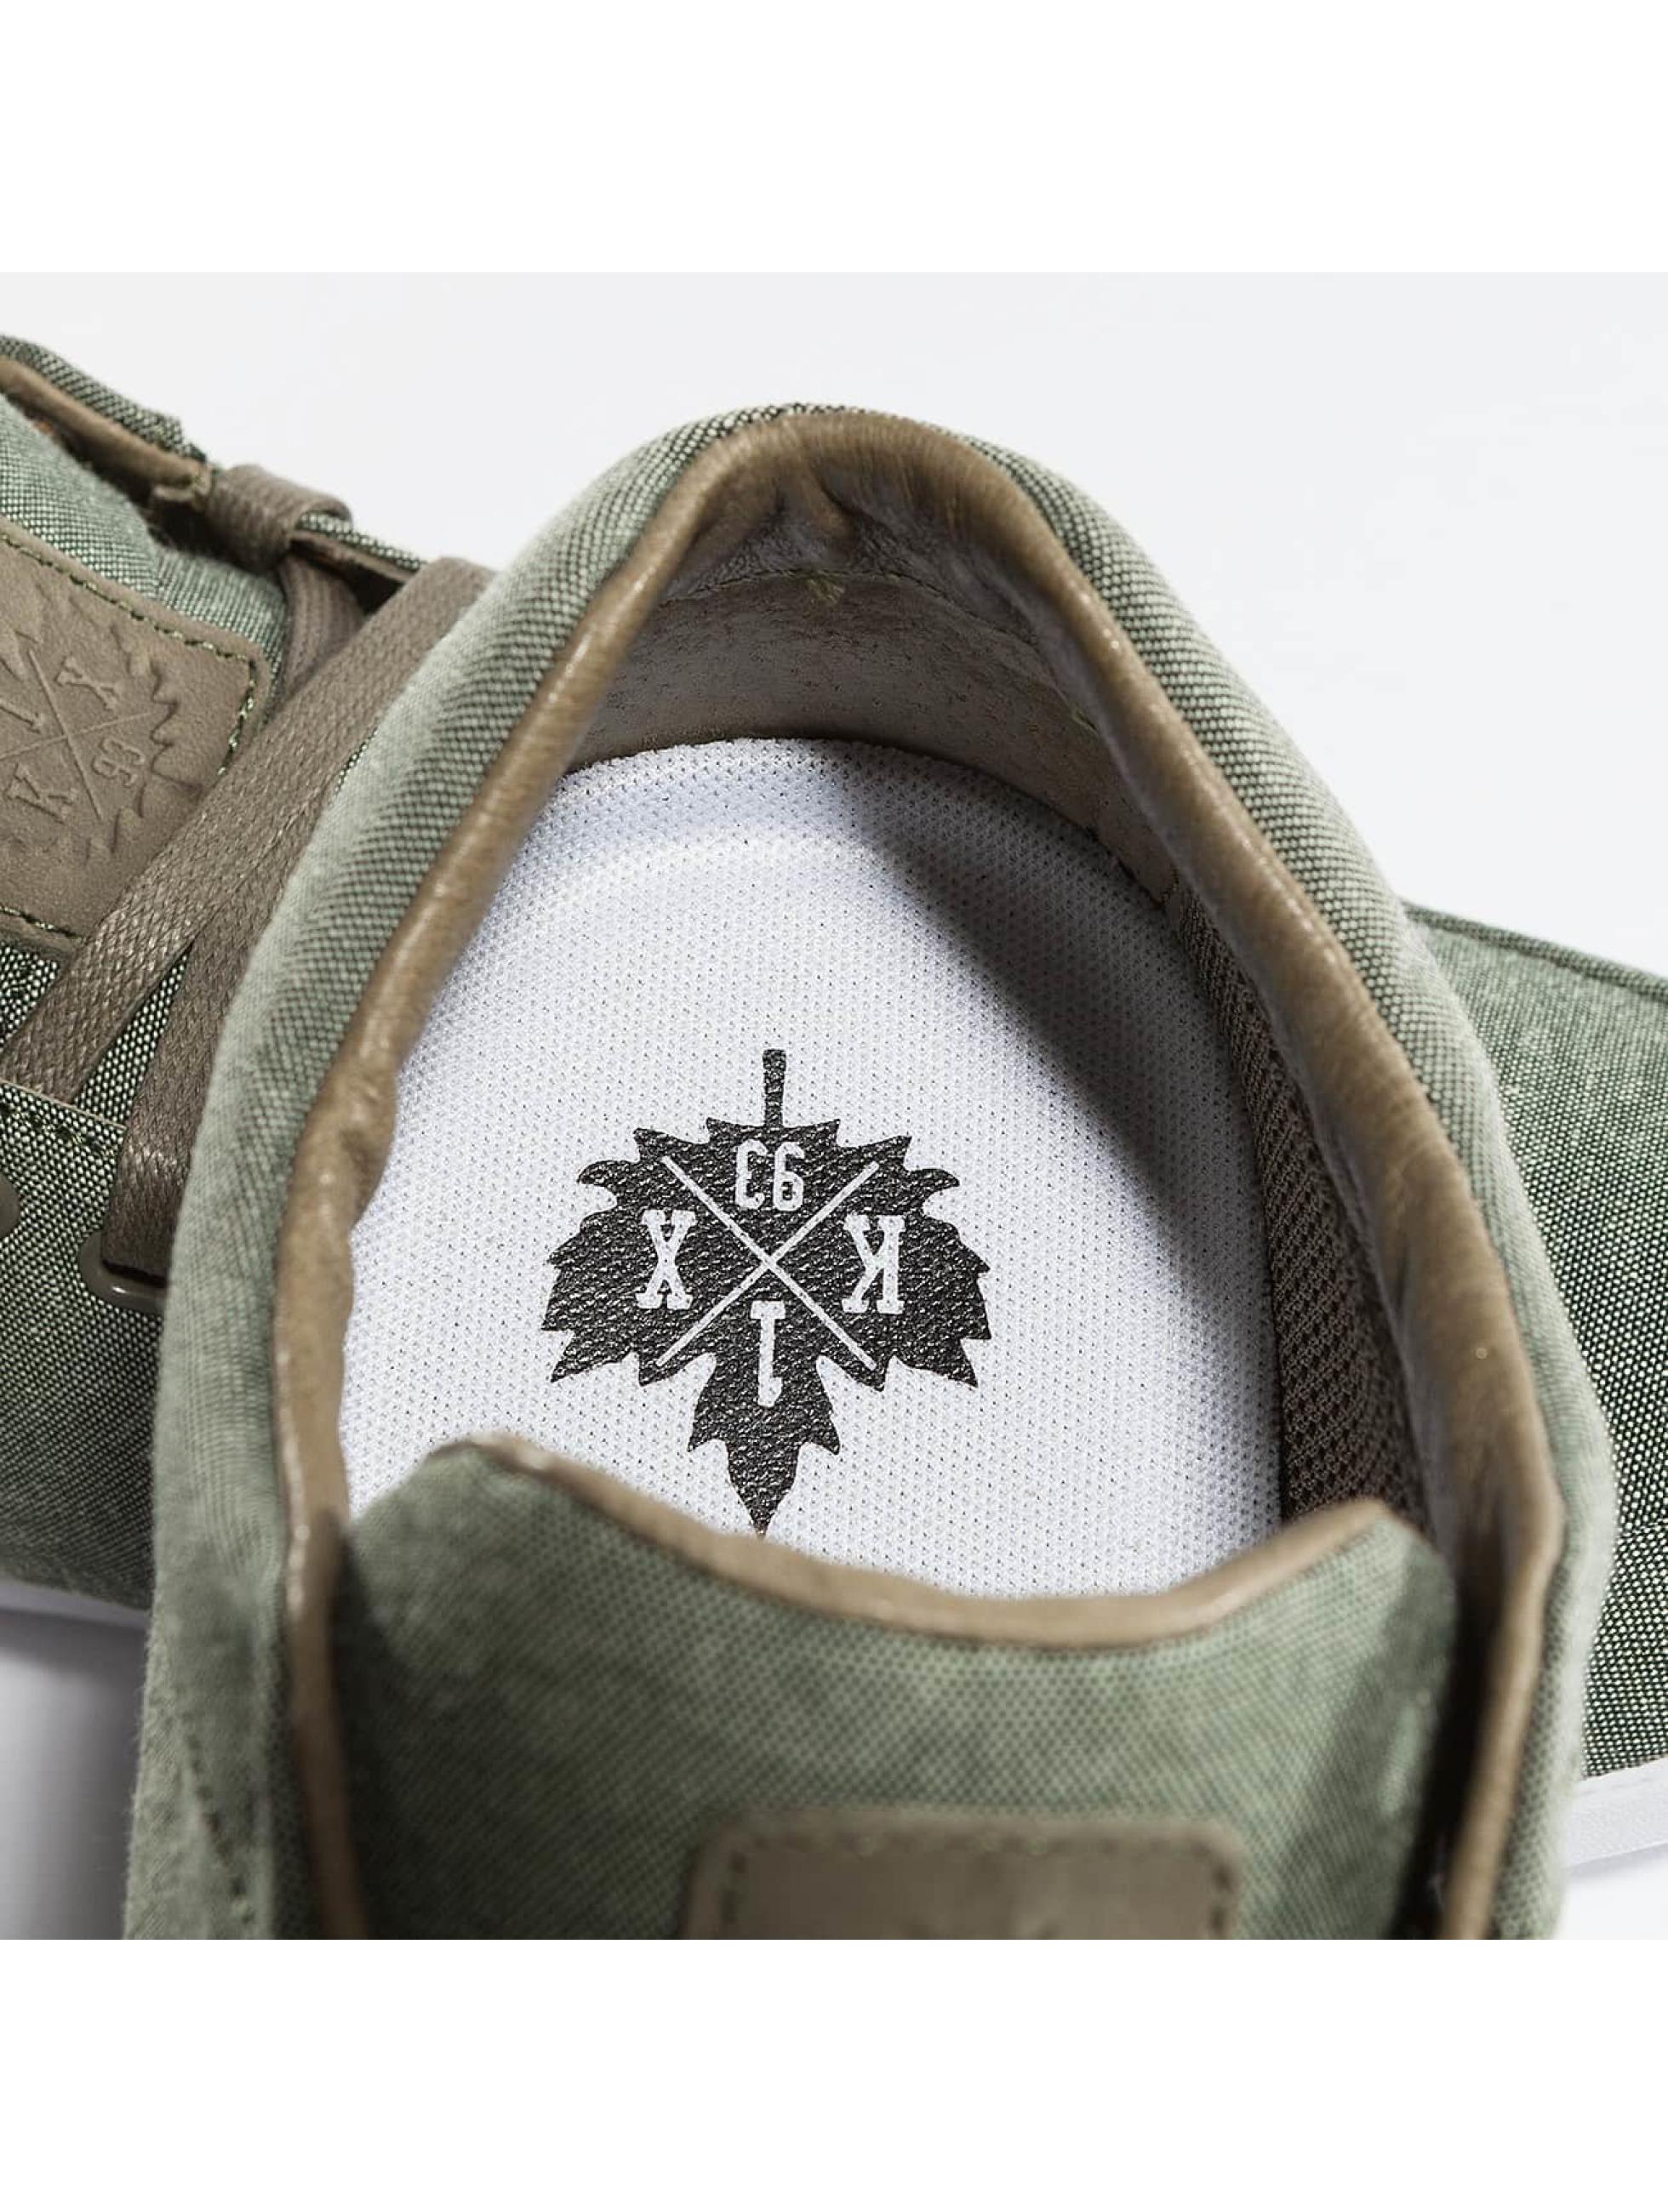 K1X Sneakers LP Low olive